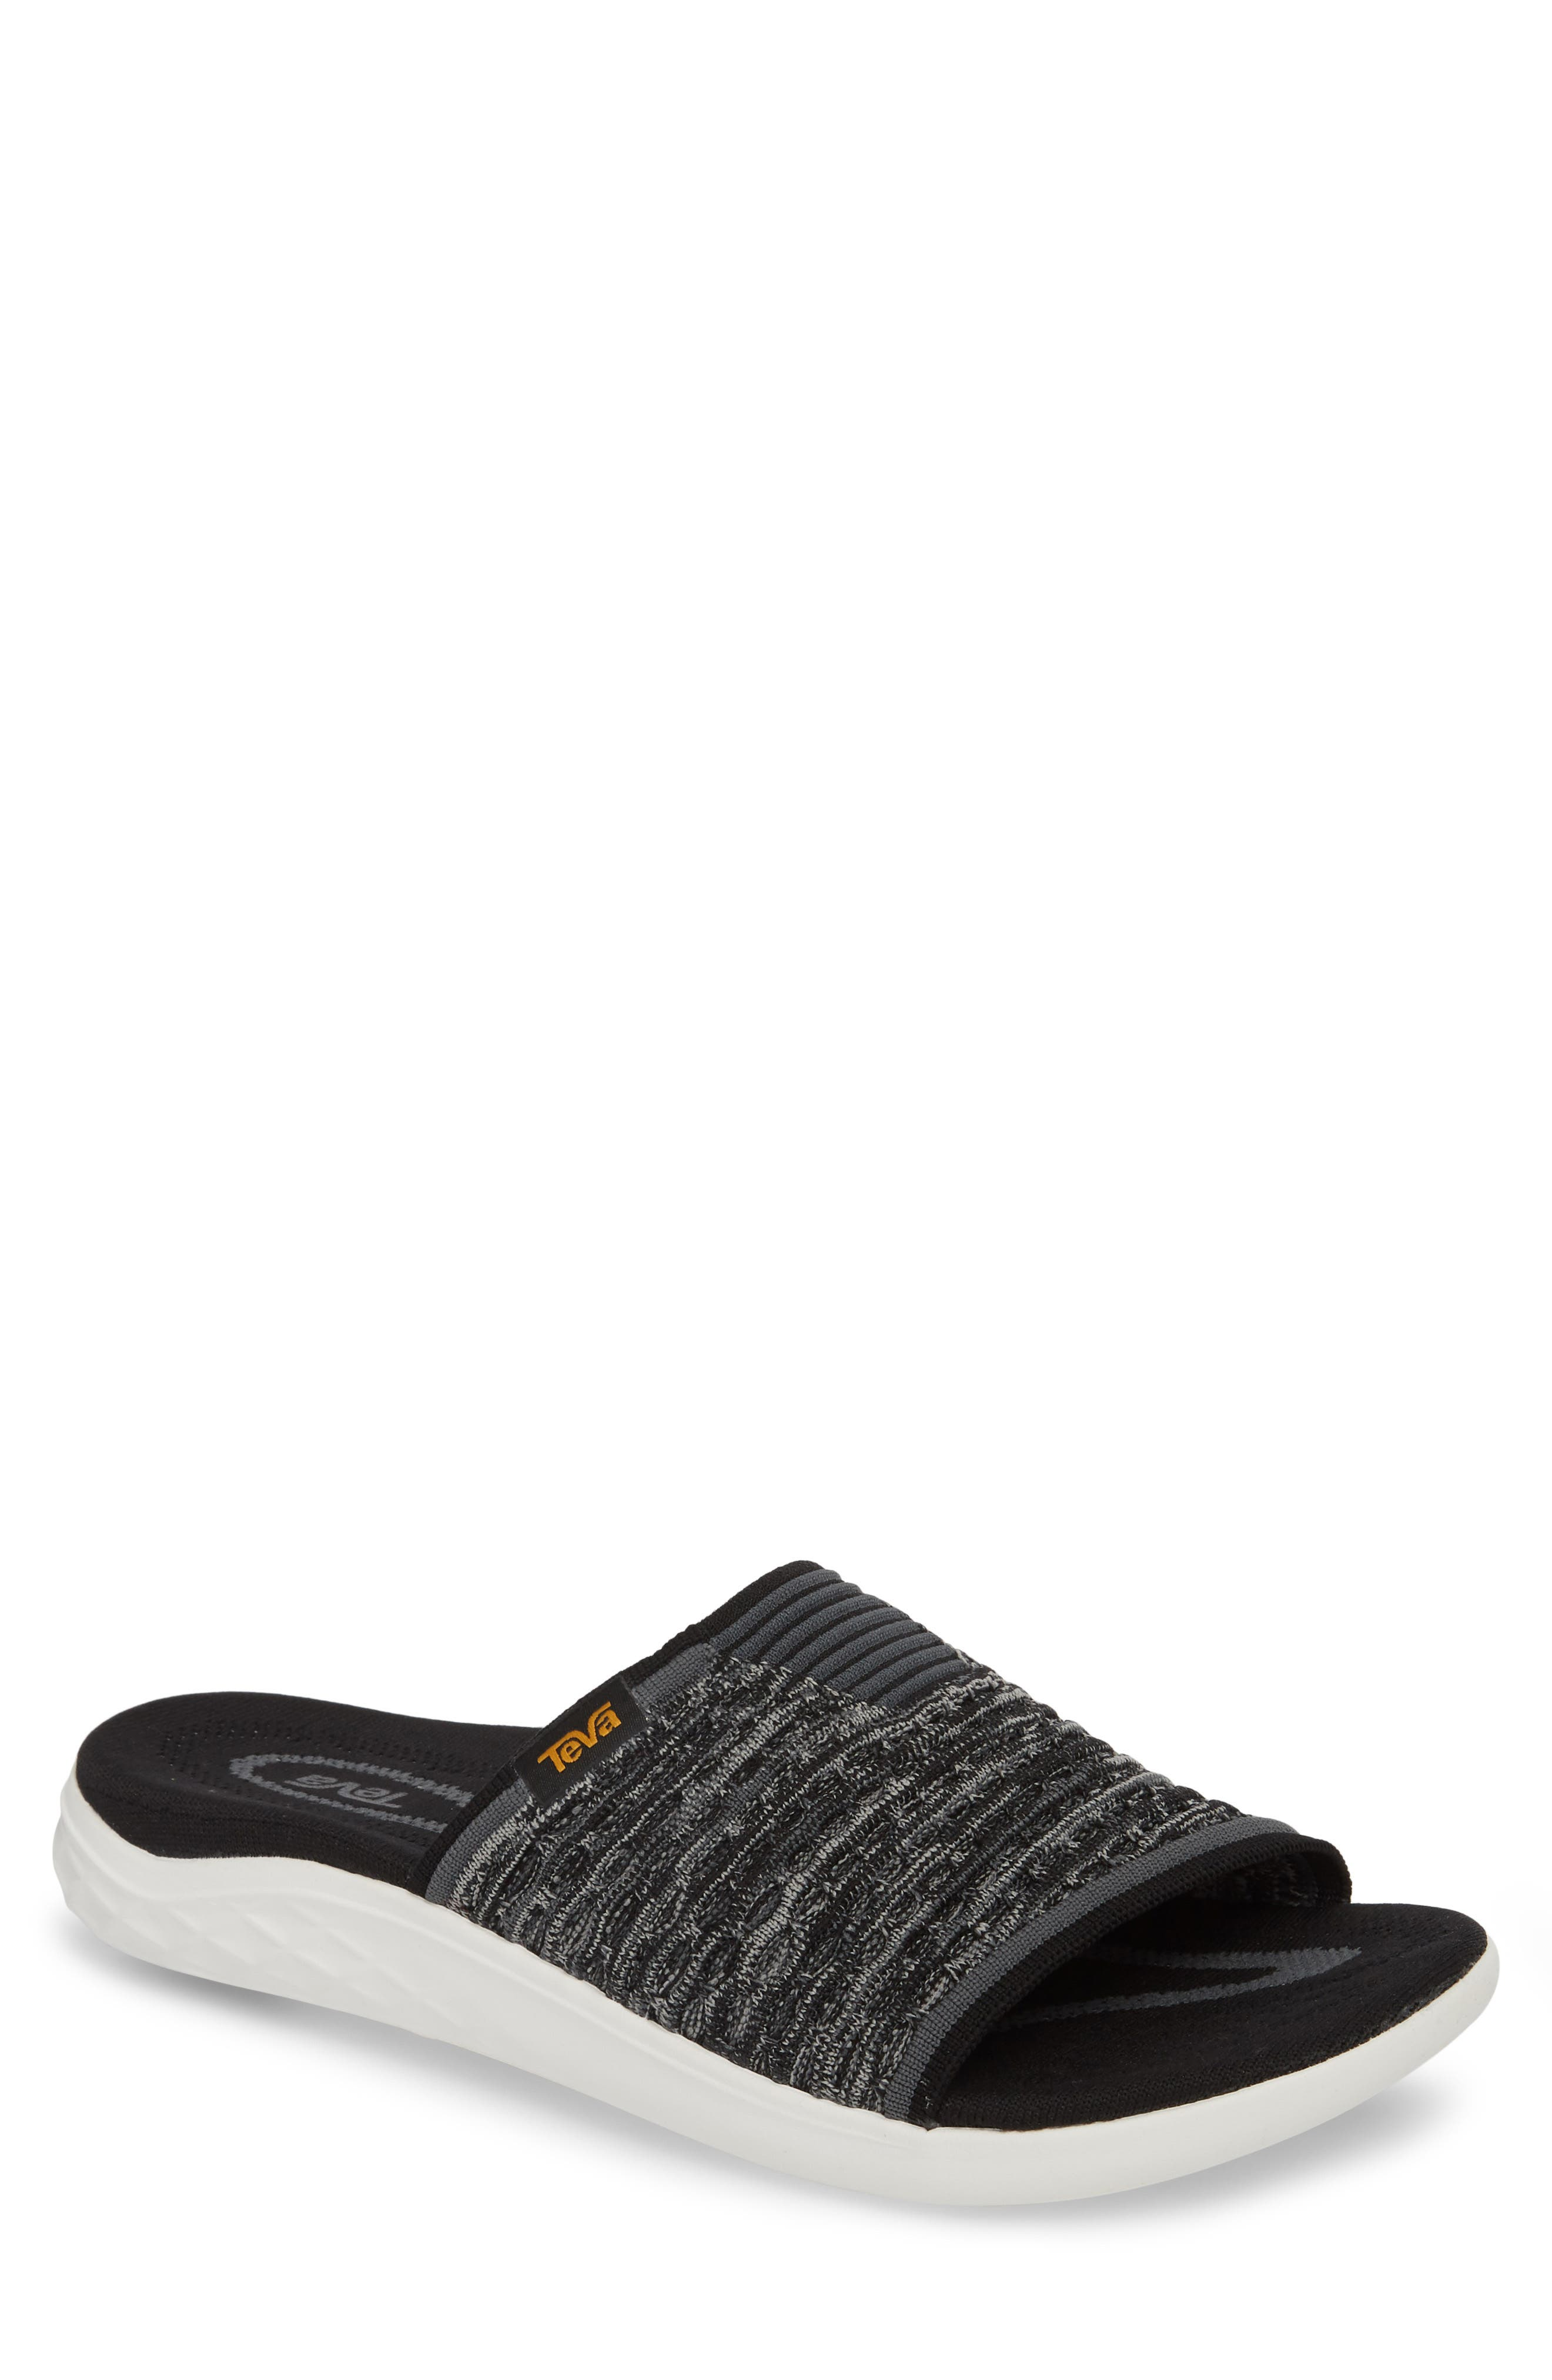 Terra-Float 2 Knit Slide Sandal,                         Main,                         color, 001